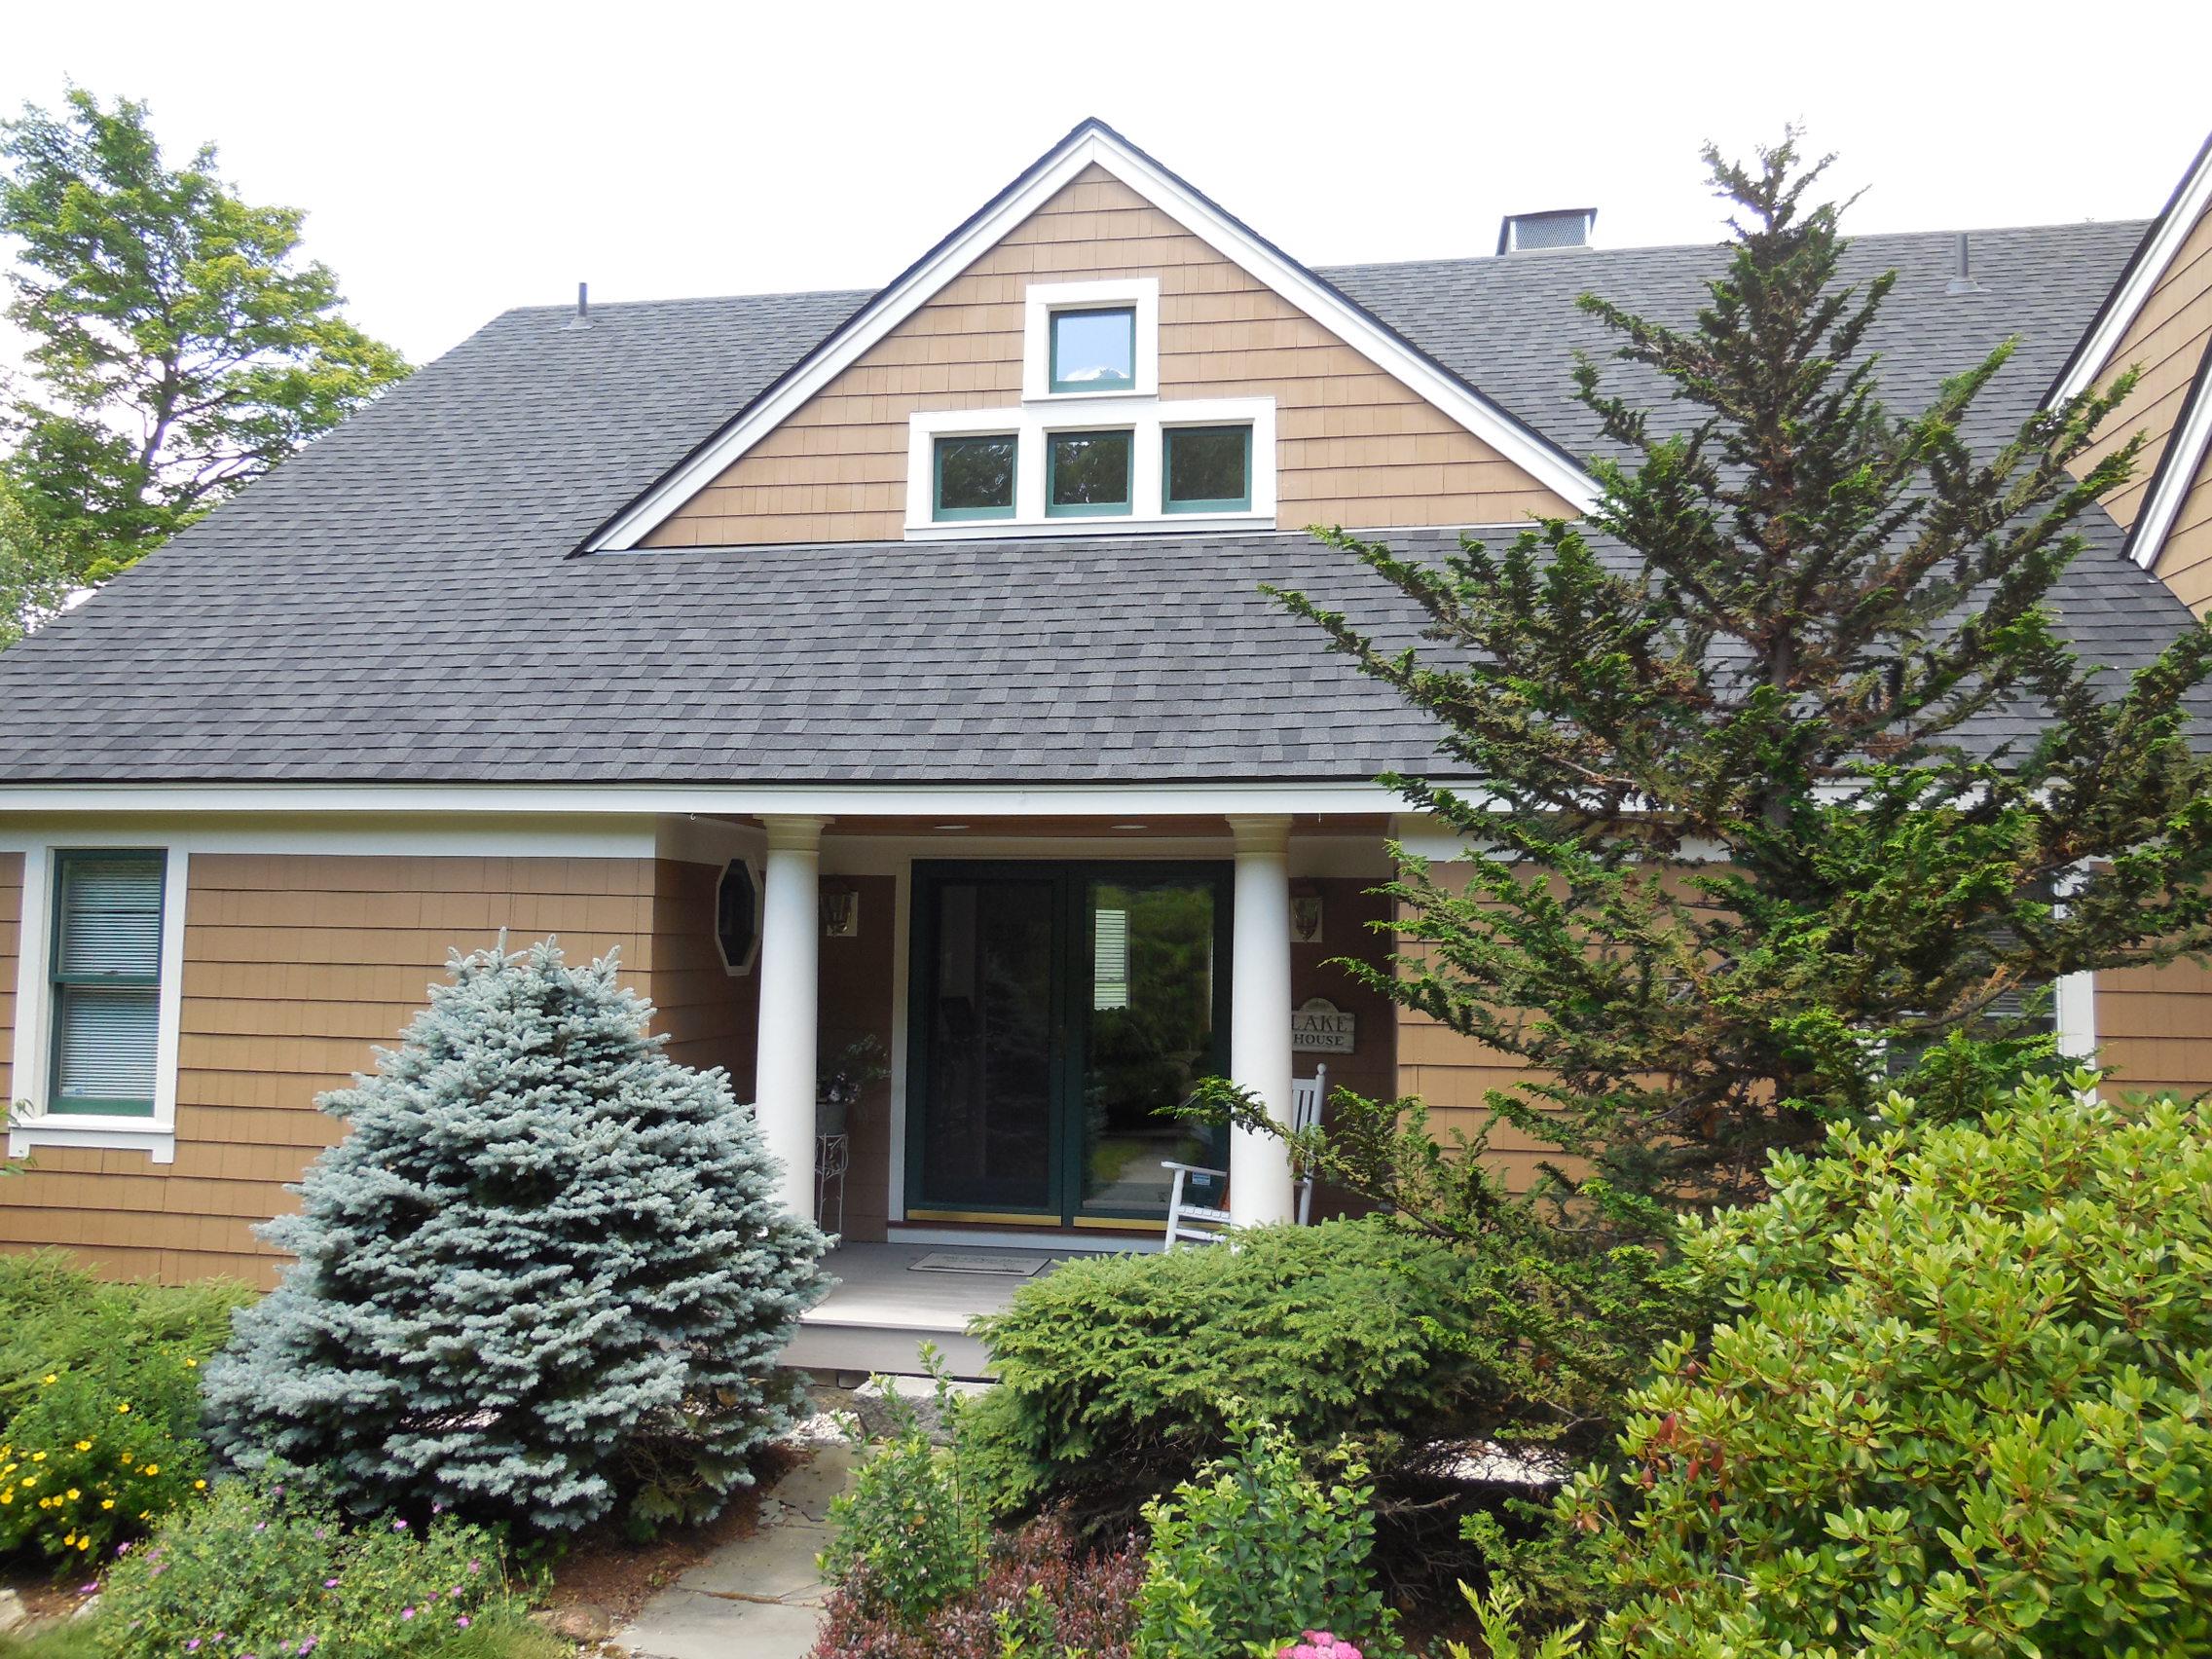 Single Family Home for Sale at 51 Blye Hill Landing, Newbury Newbury, New Hampshire, 03255 United States